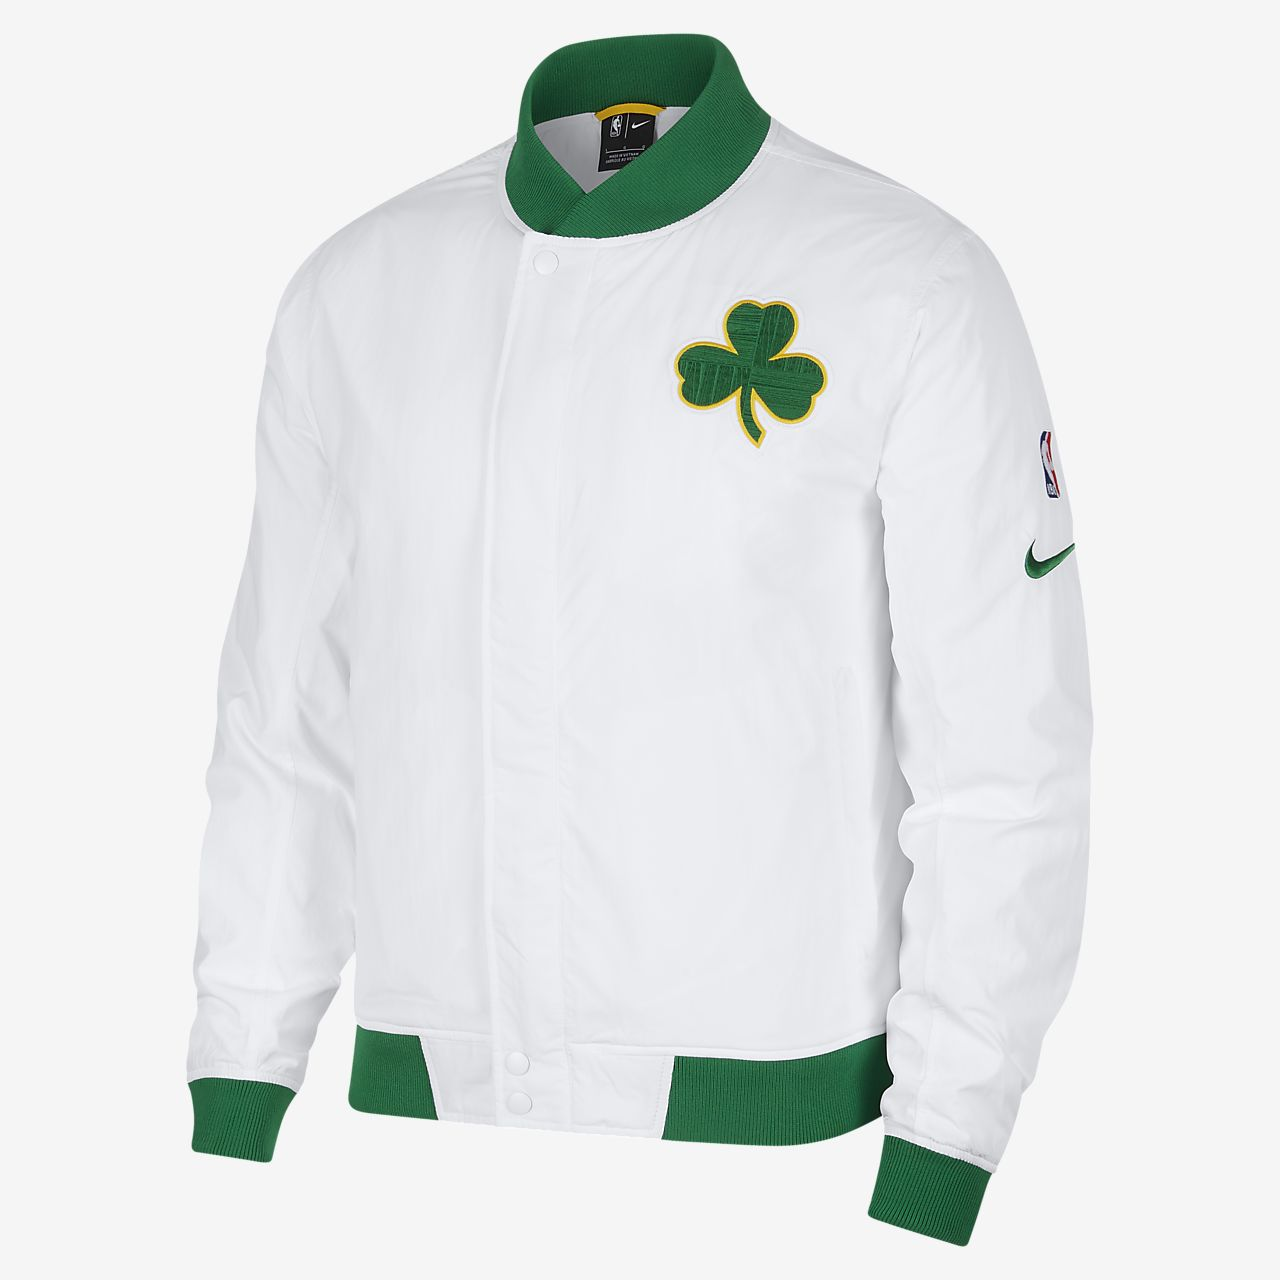 c0b3ffef7 Boston Celtics Nike Courtside Men's NBA Jacket. Nike.com SI